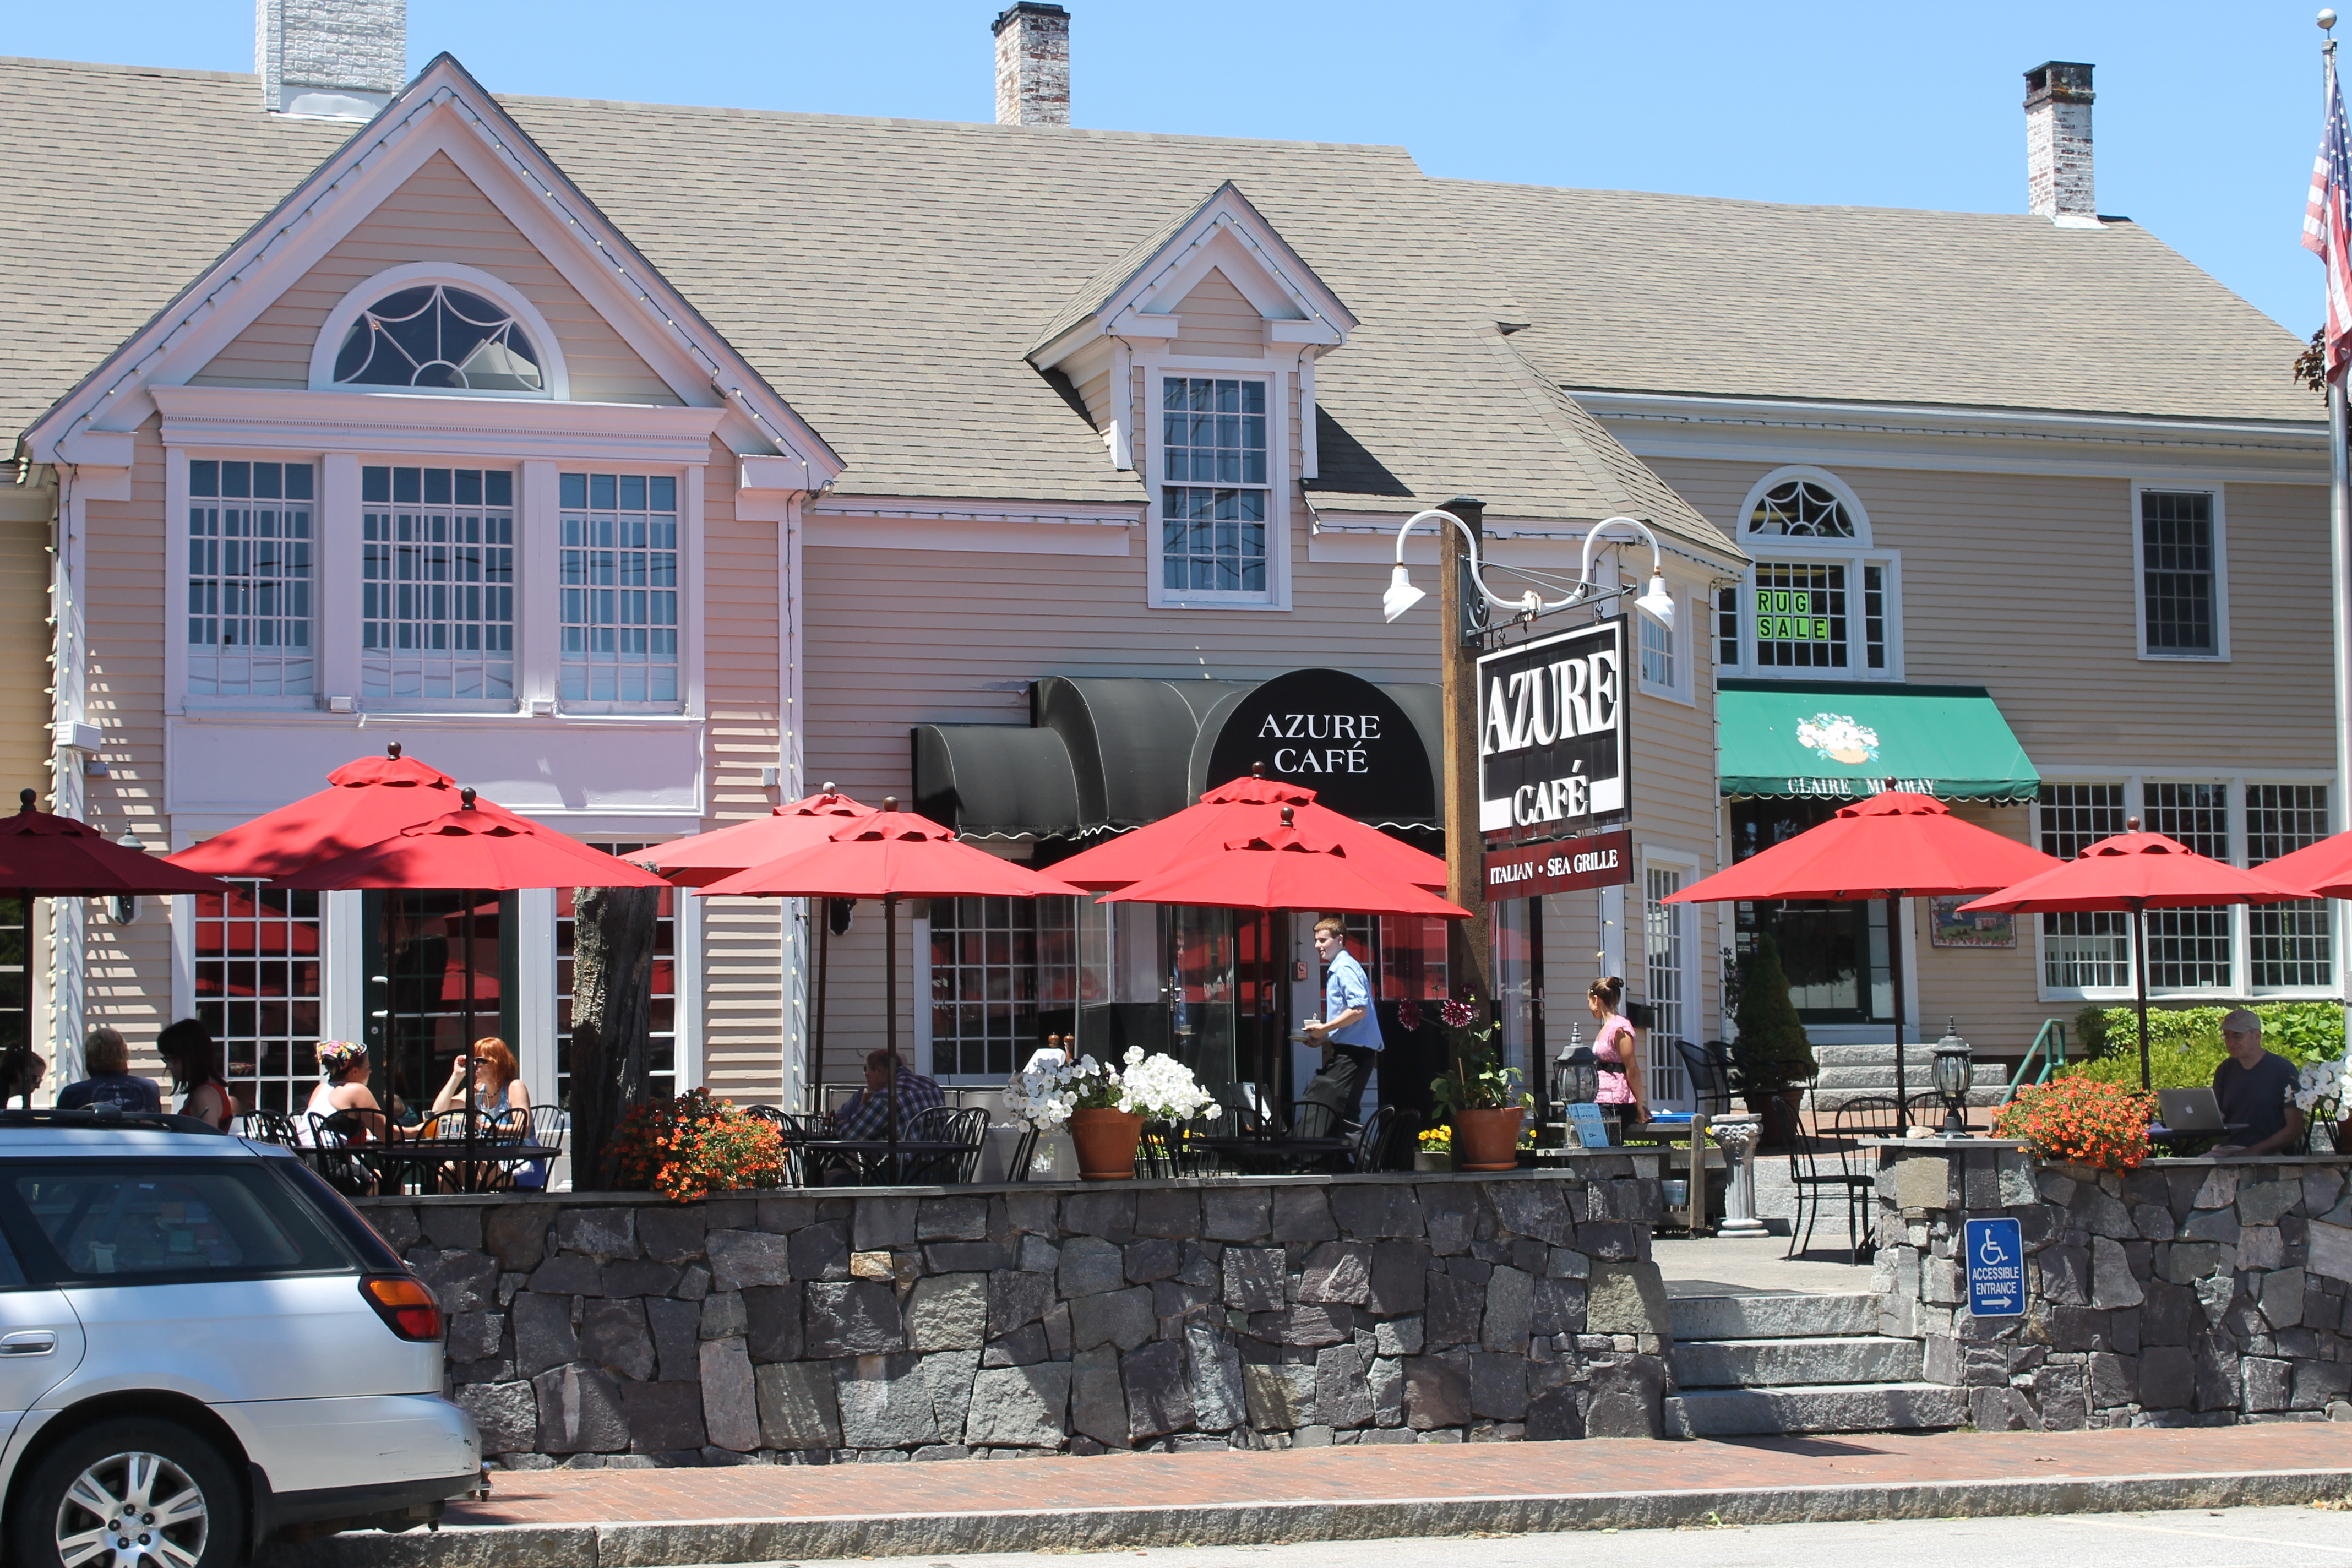 Azure Cafe Main Street Freeport Maine